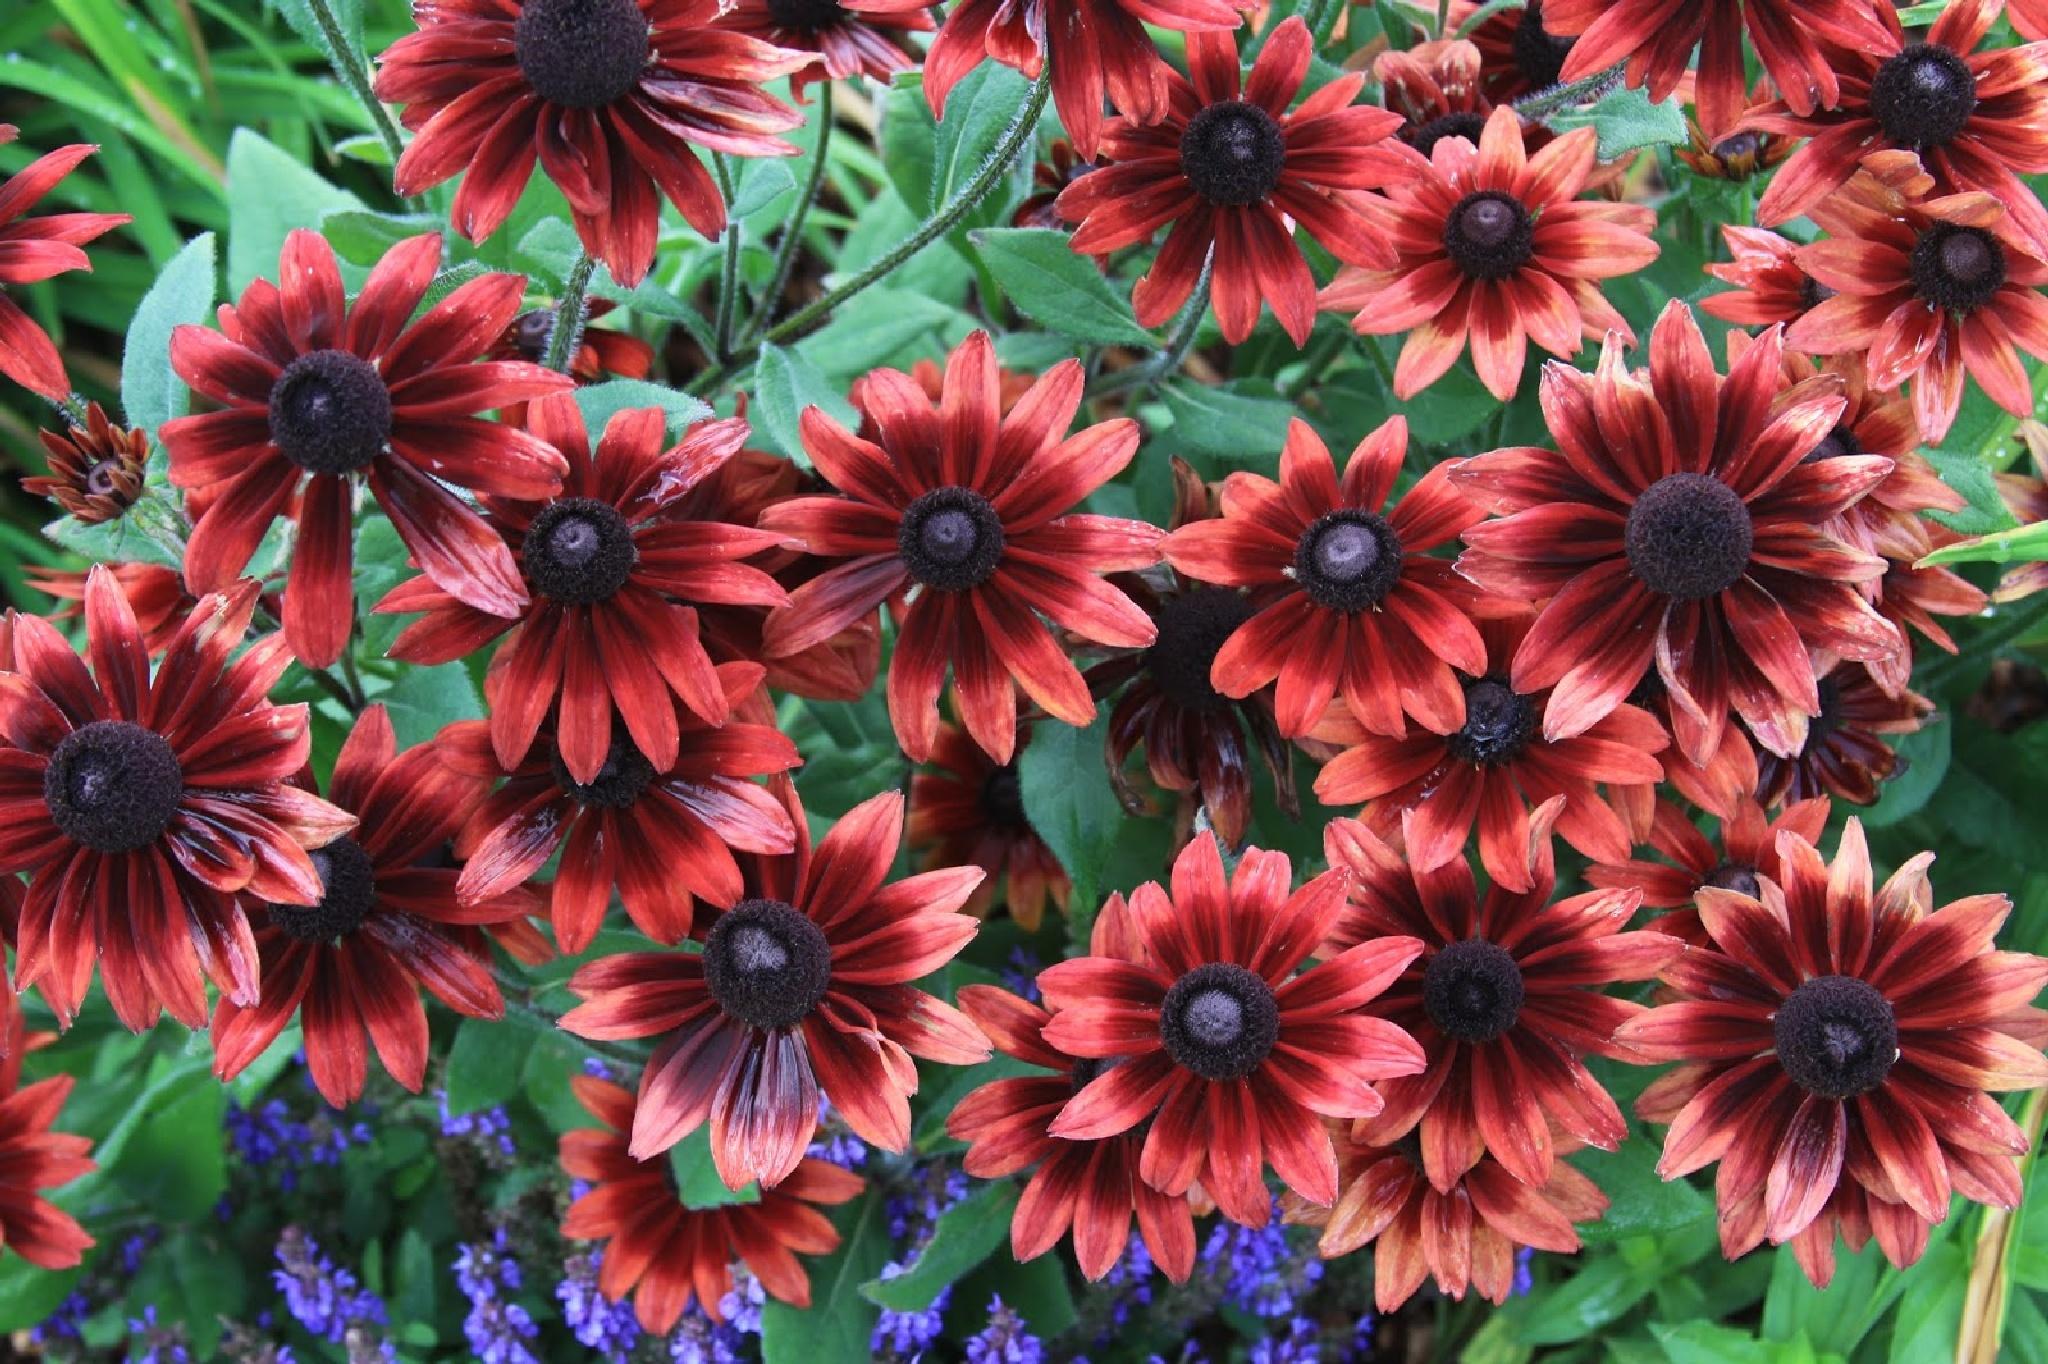 Buy Beautiful Cherry Brandy Black-Eyed Susan Perennials by RayAustin